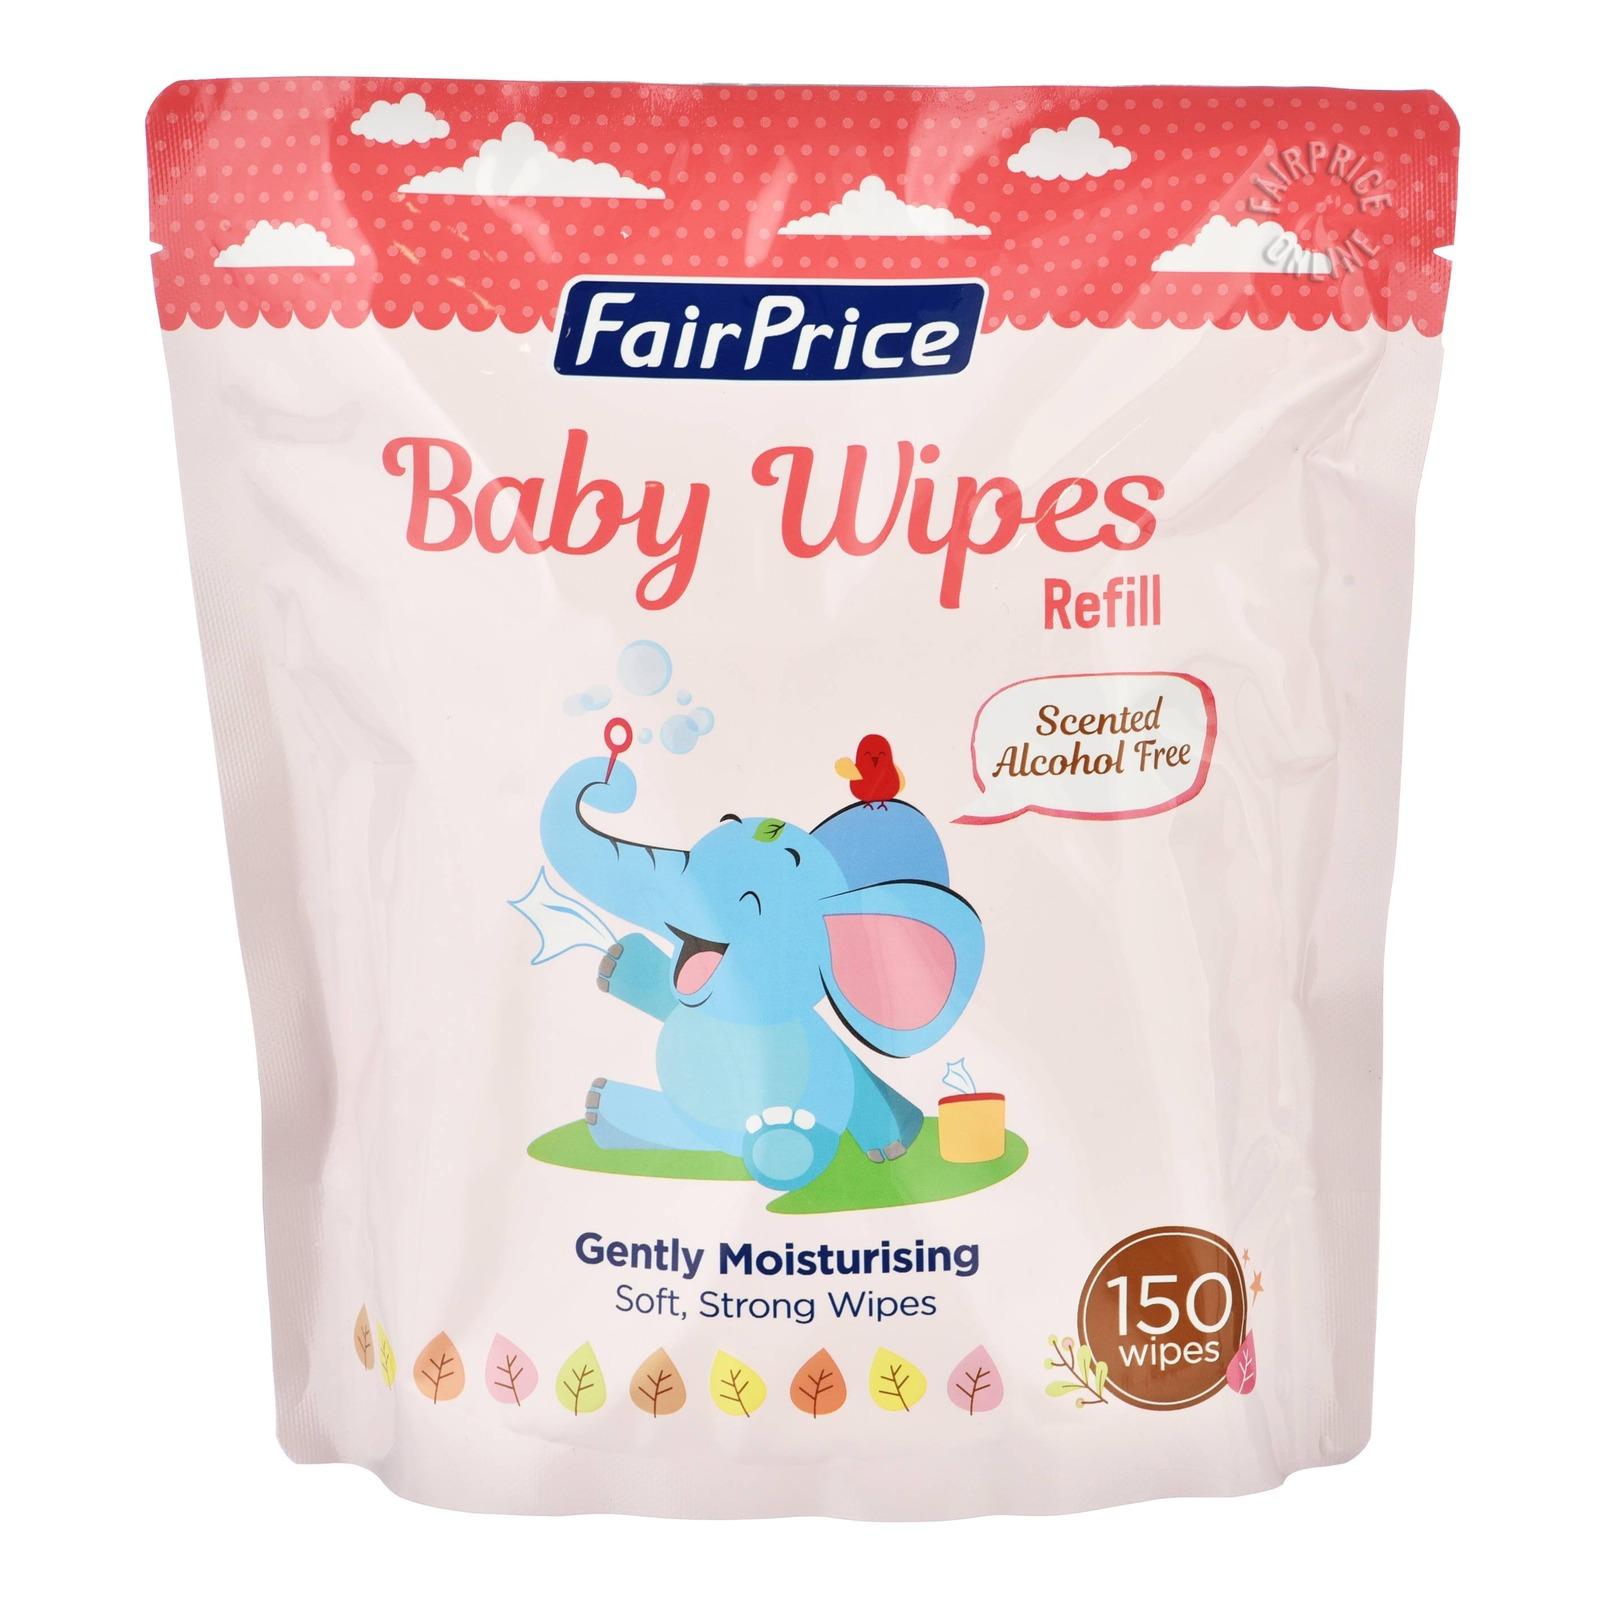 FairPrice Baby Wet Wipes Refill - Gently Moisturising